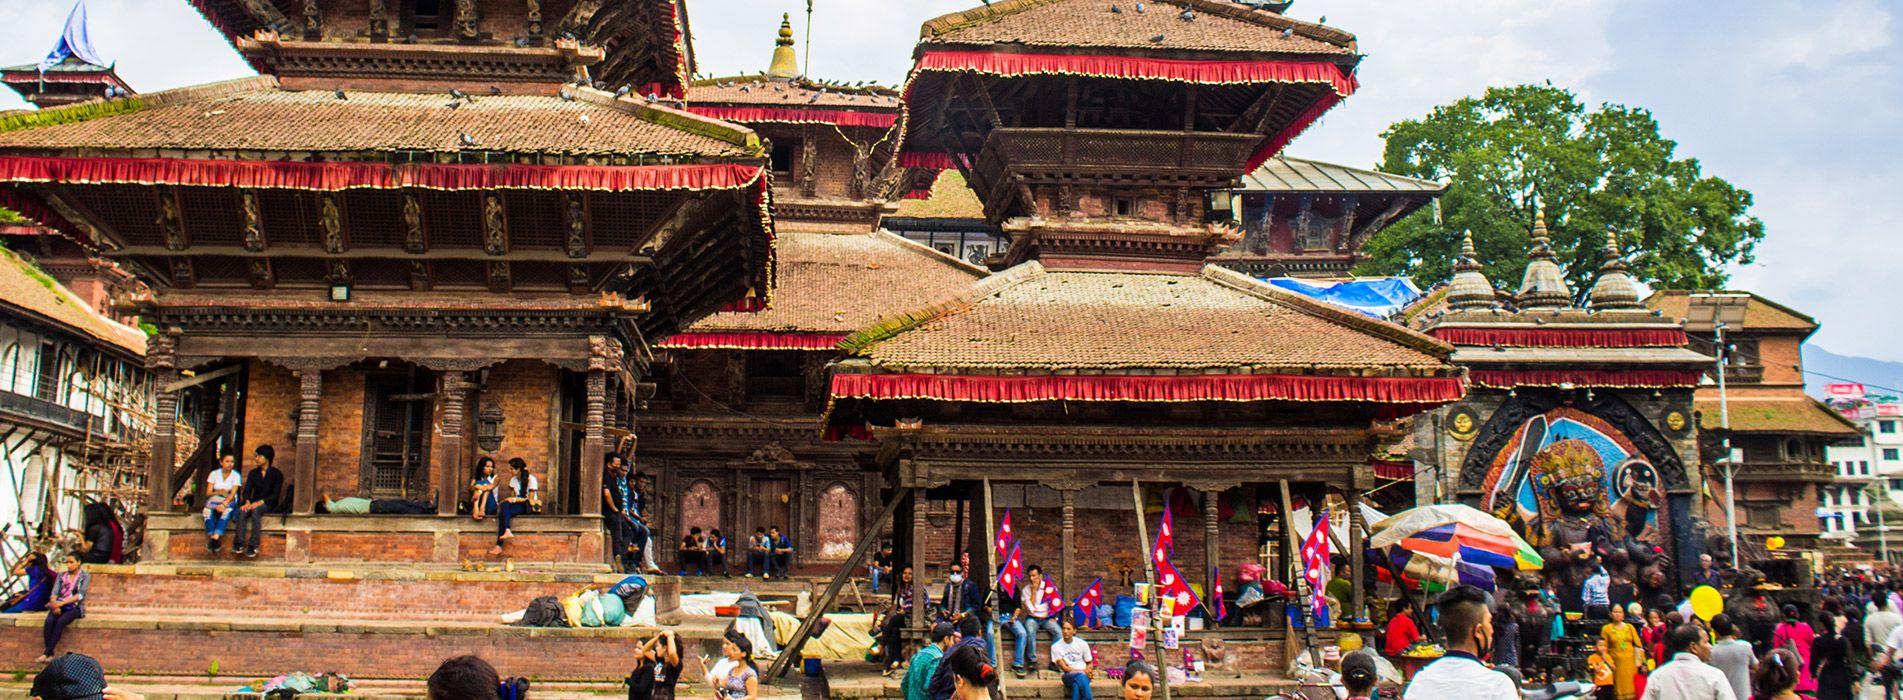 Things to do in Kathmandu valley